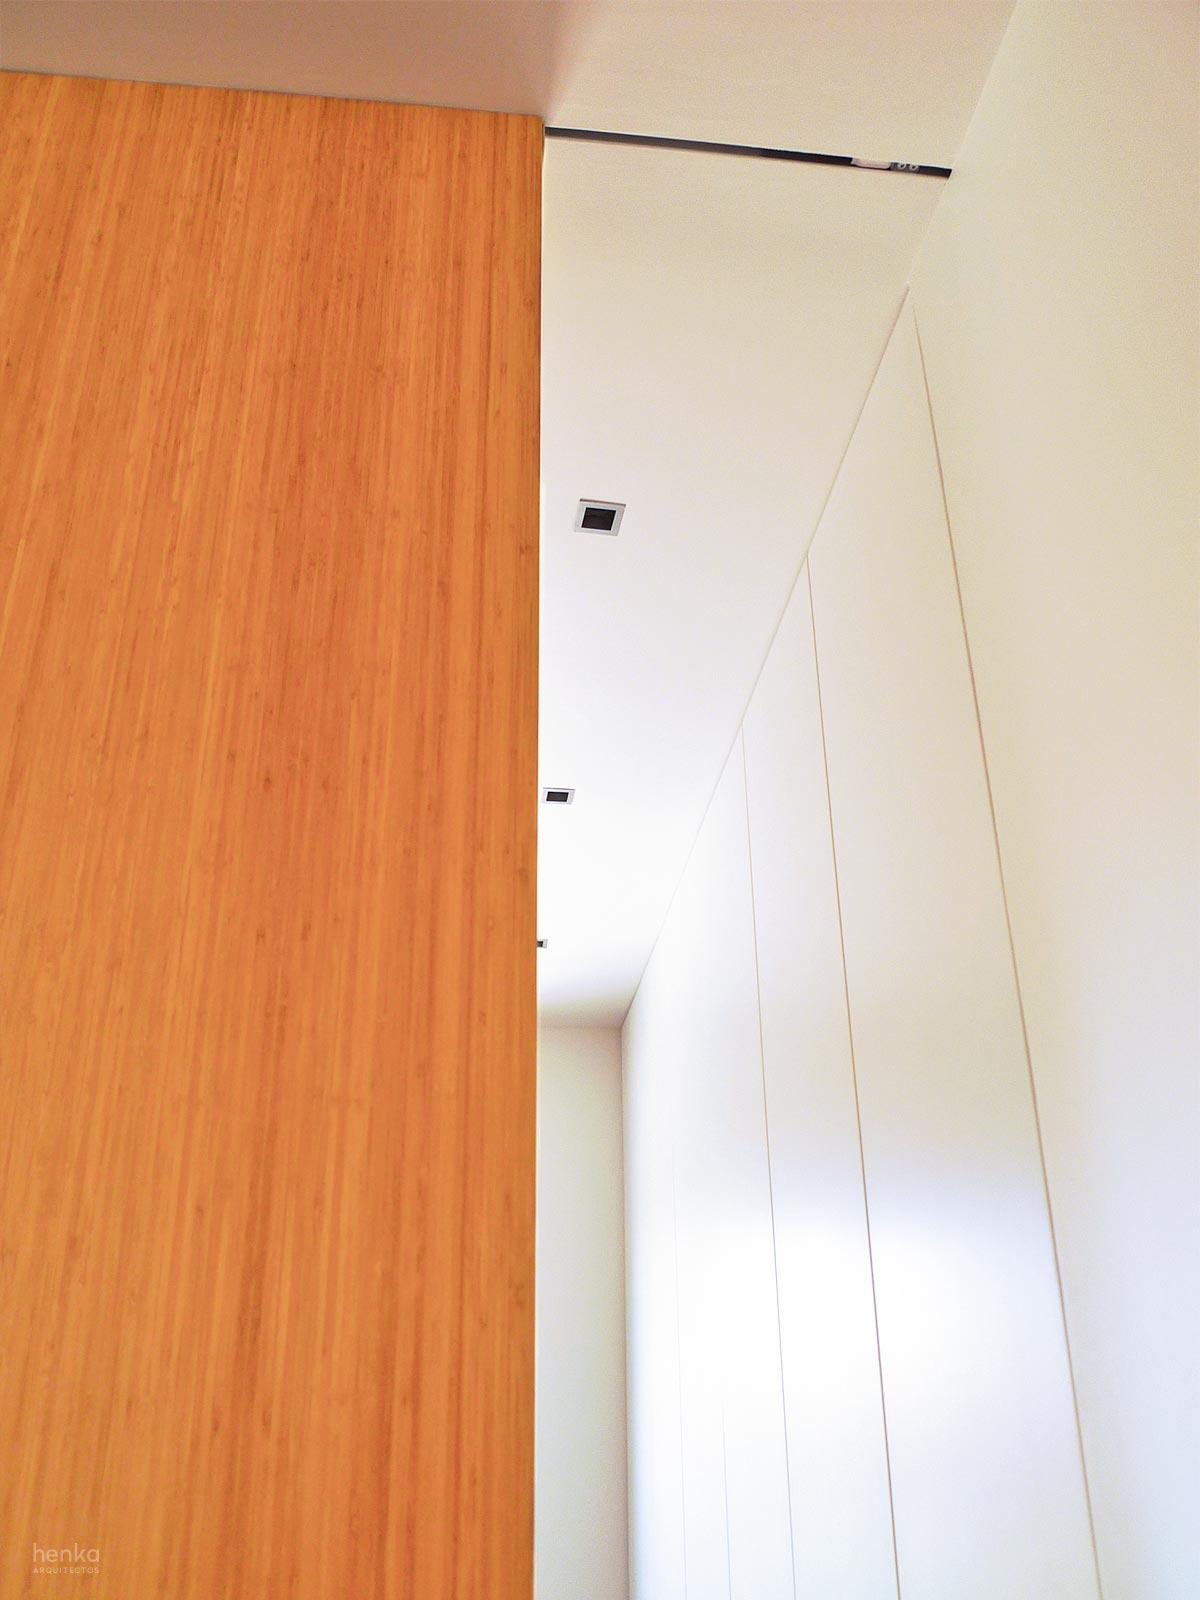 Puerta corredera madera maciza bambú 40 mm Reforma Adosado Giron Pinilla Zamora HenkaArquitectos